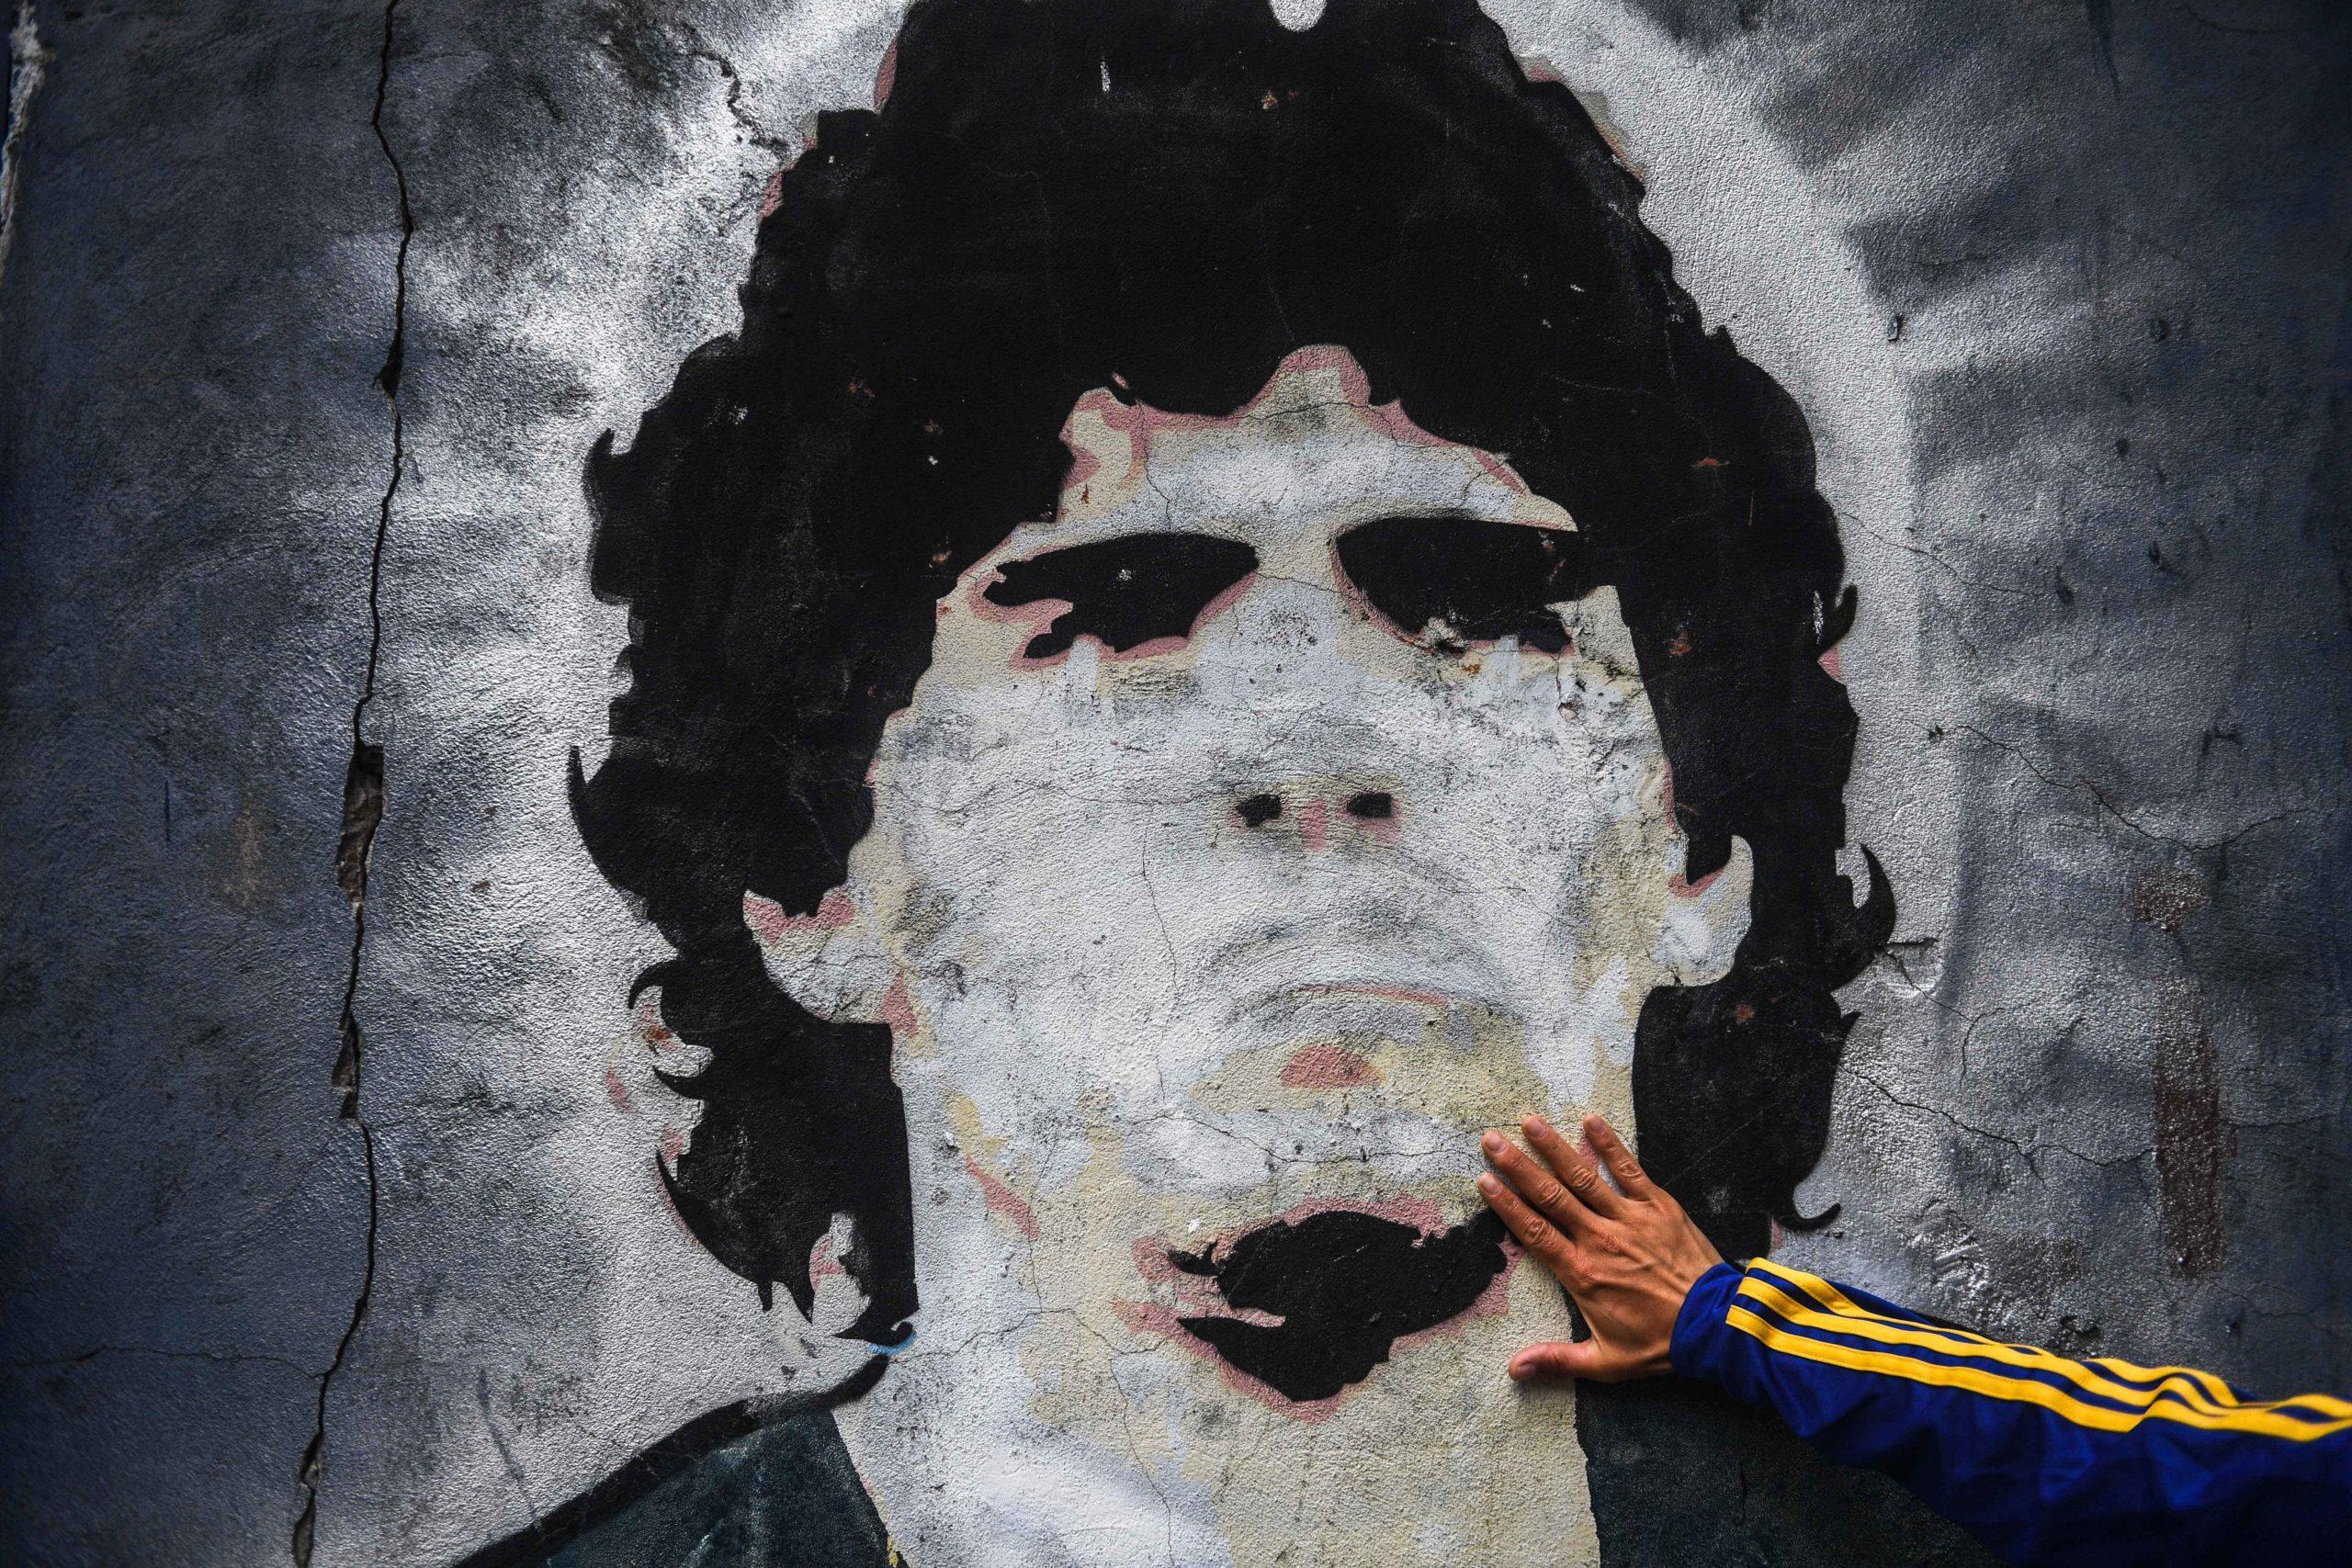 OM - SI près de Marseille, Bernard Tapie regrette de ne pas avoir signé Maradona